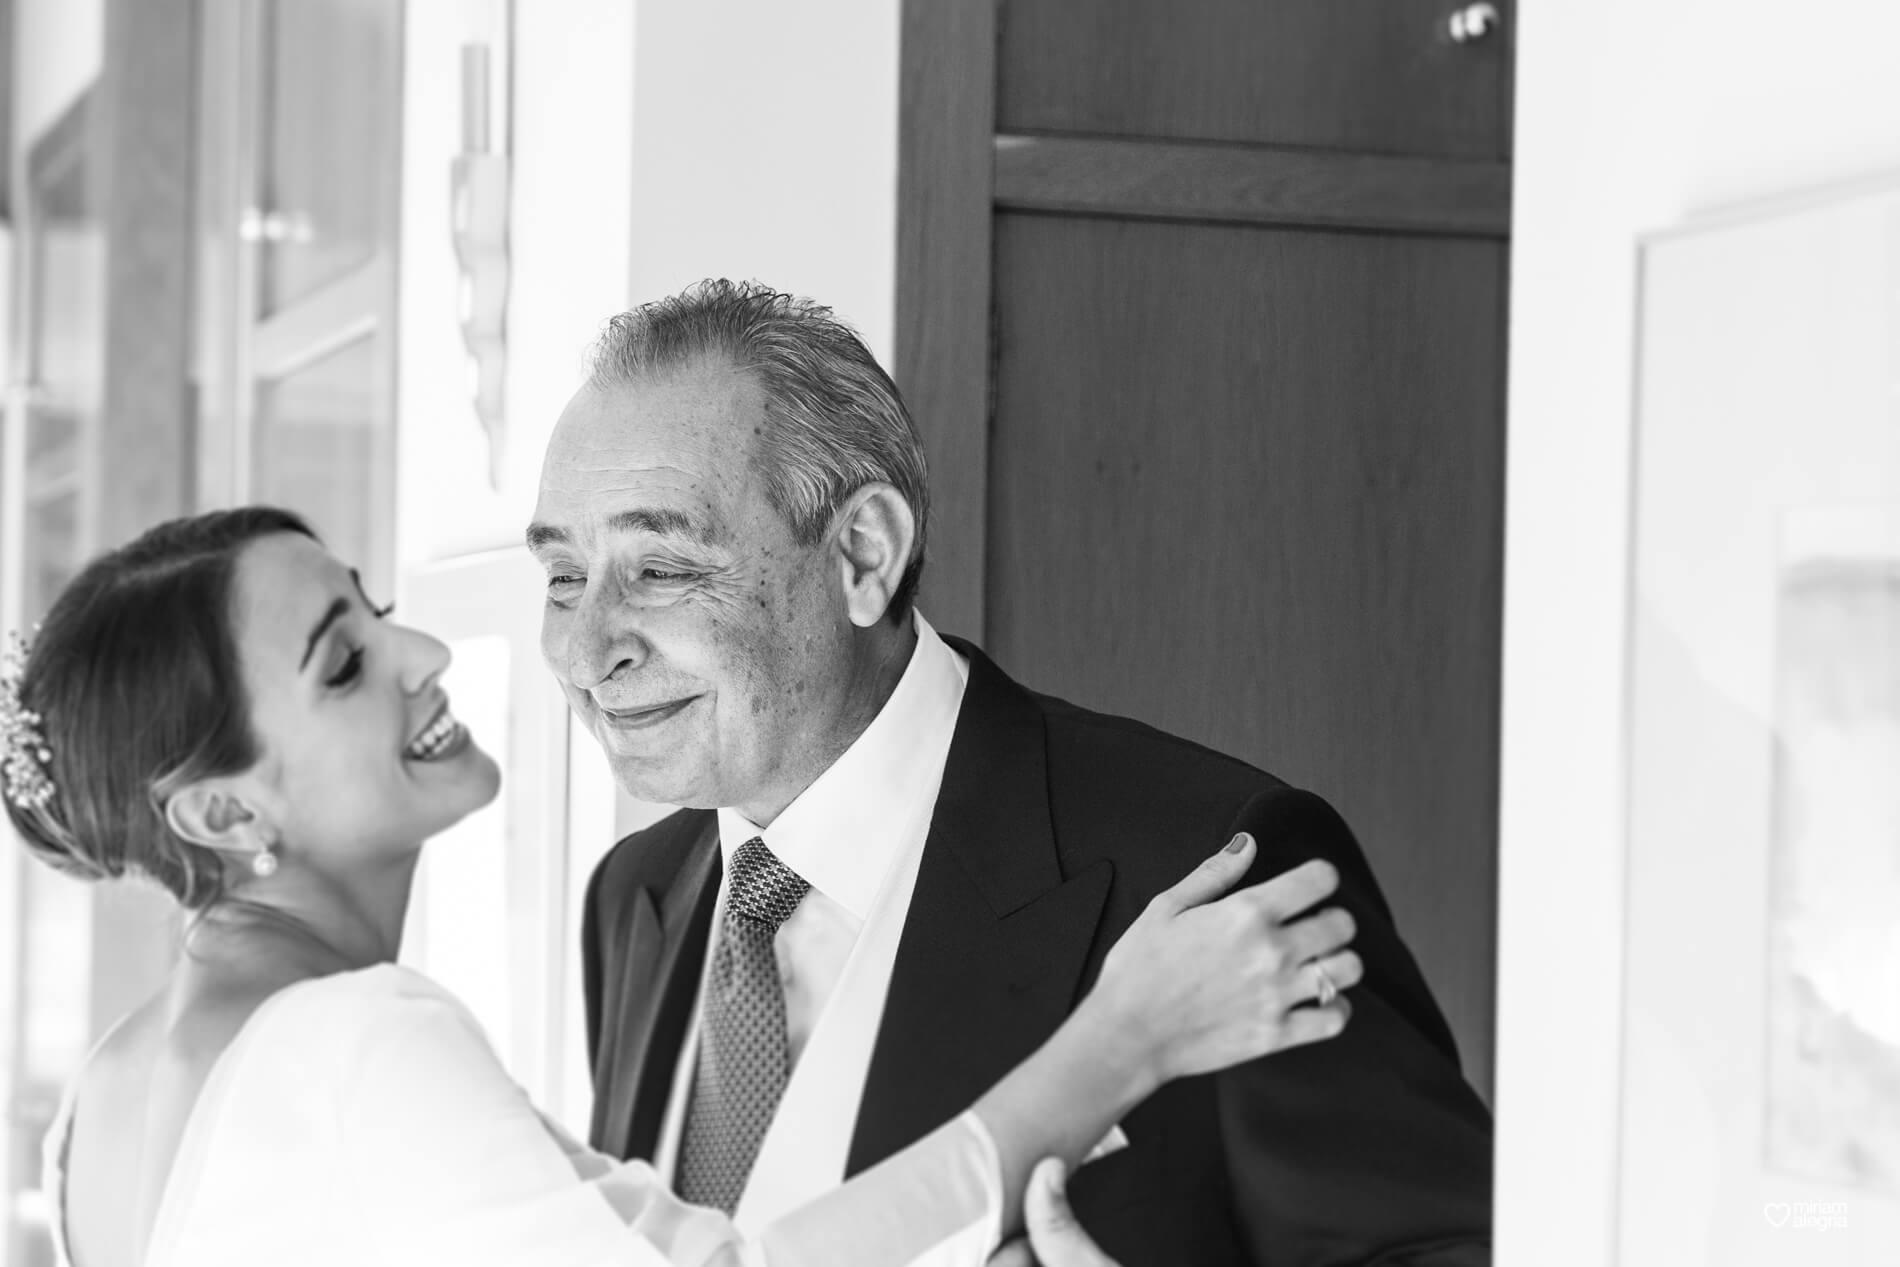 vestido-de-novia-paula-del-vas-miriam-alegria-fotografos-boda-murcia-27